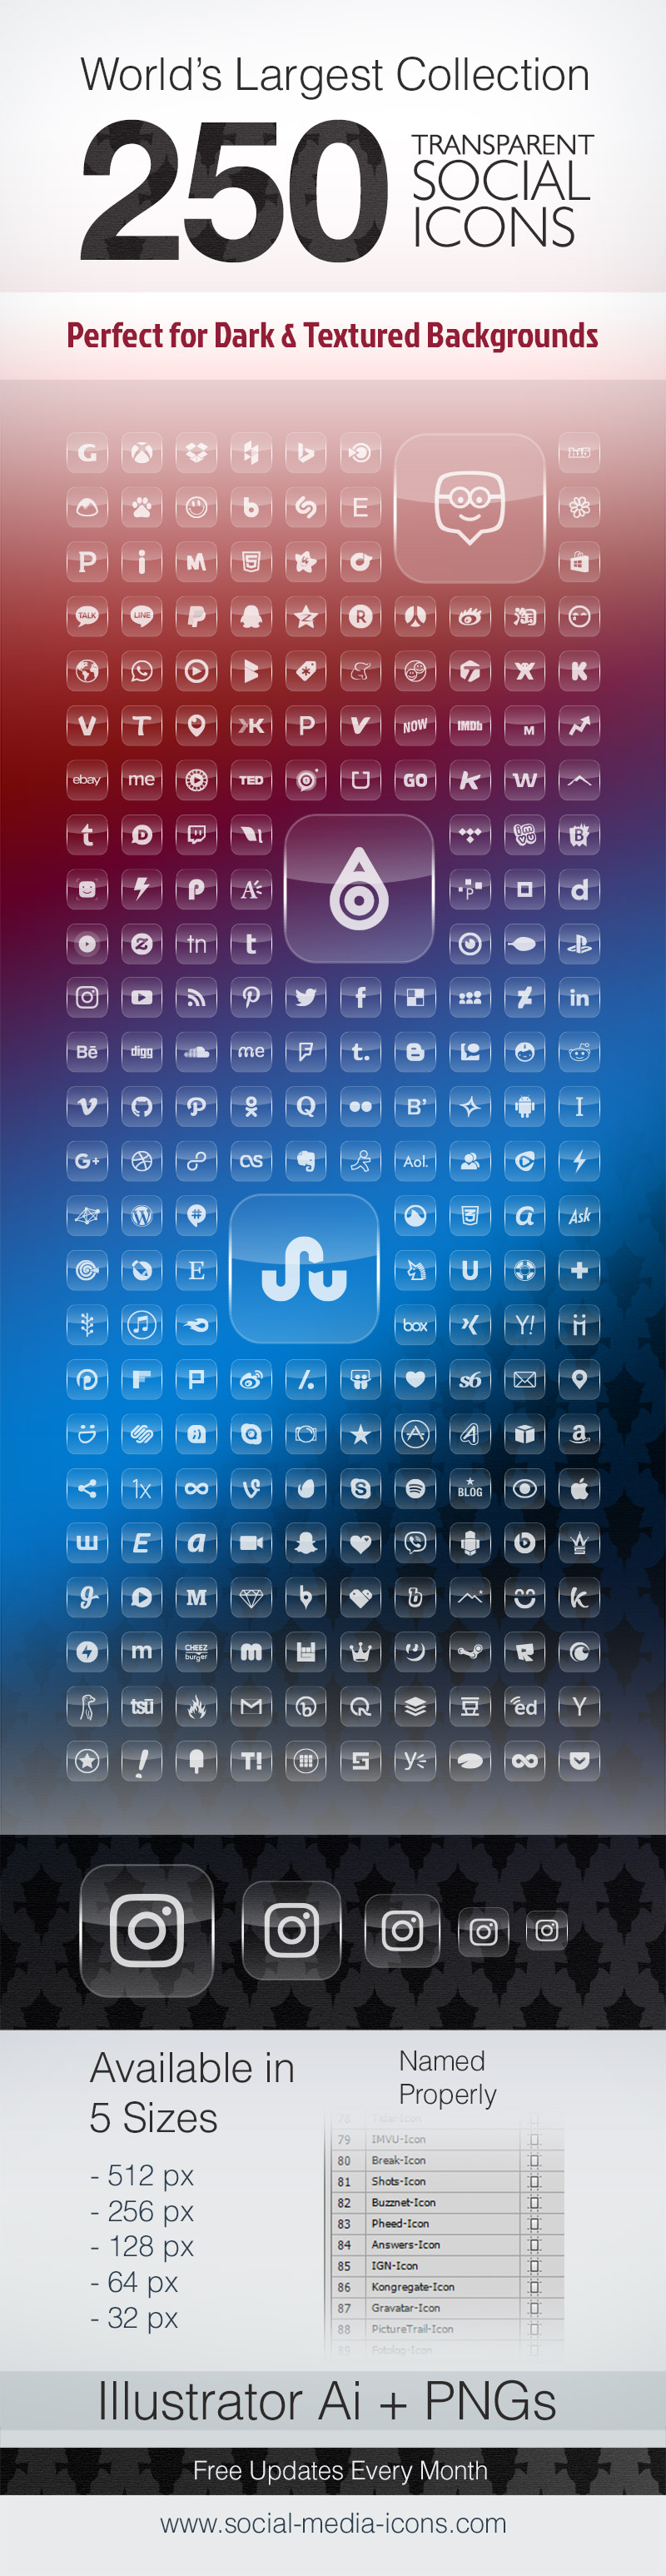 250-Premium-Transparent-Social-Media-Icons-for-Dark-Website-Backgrounds